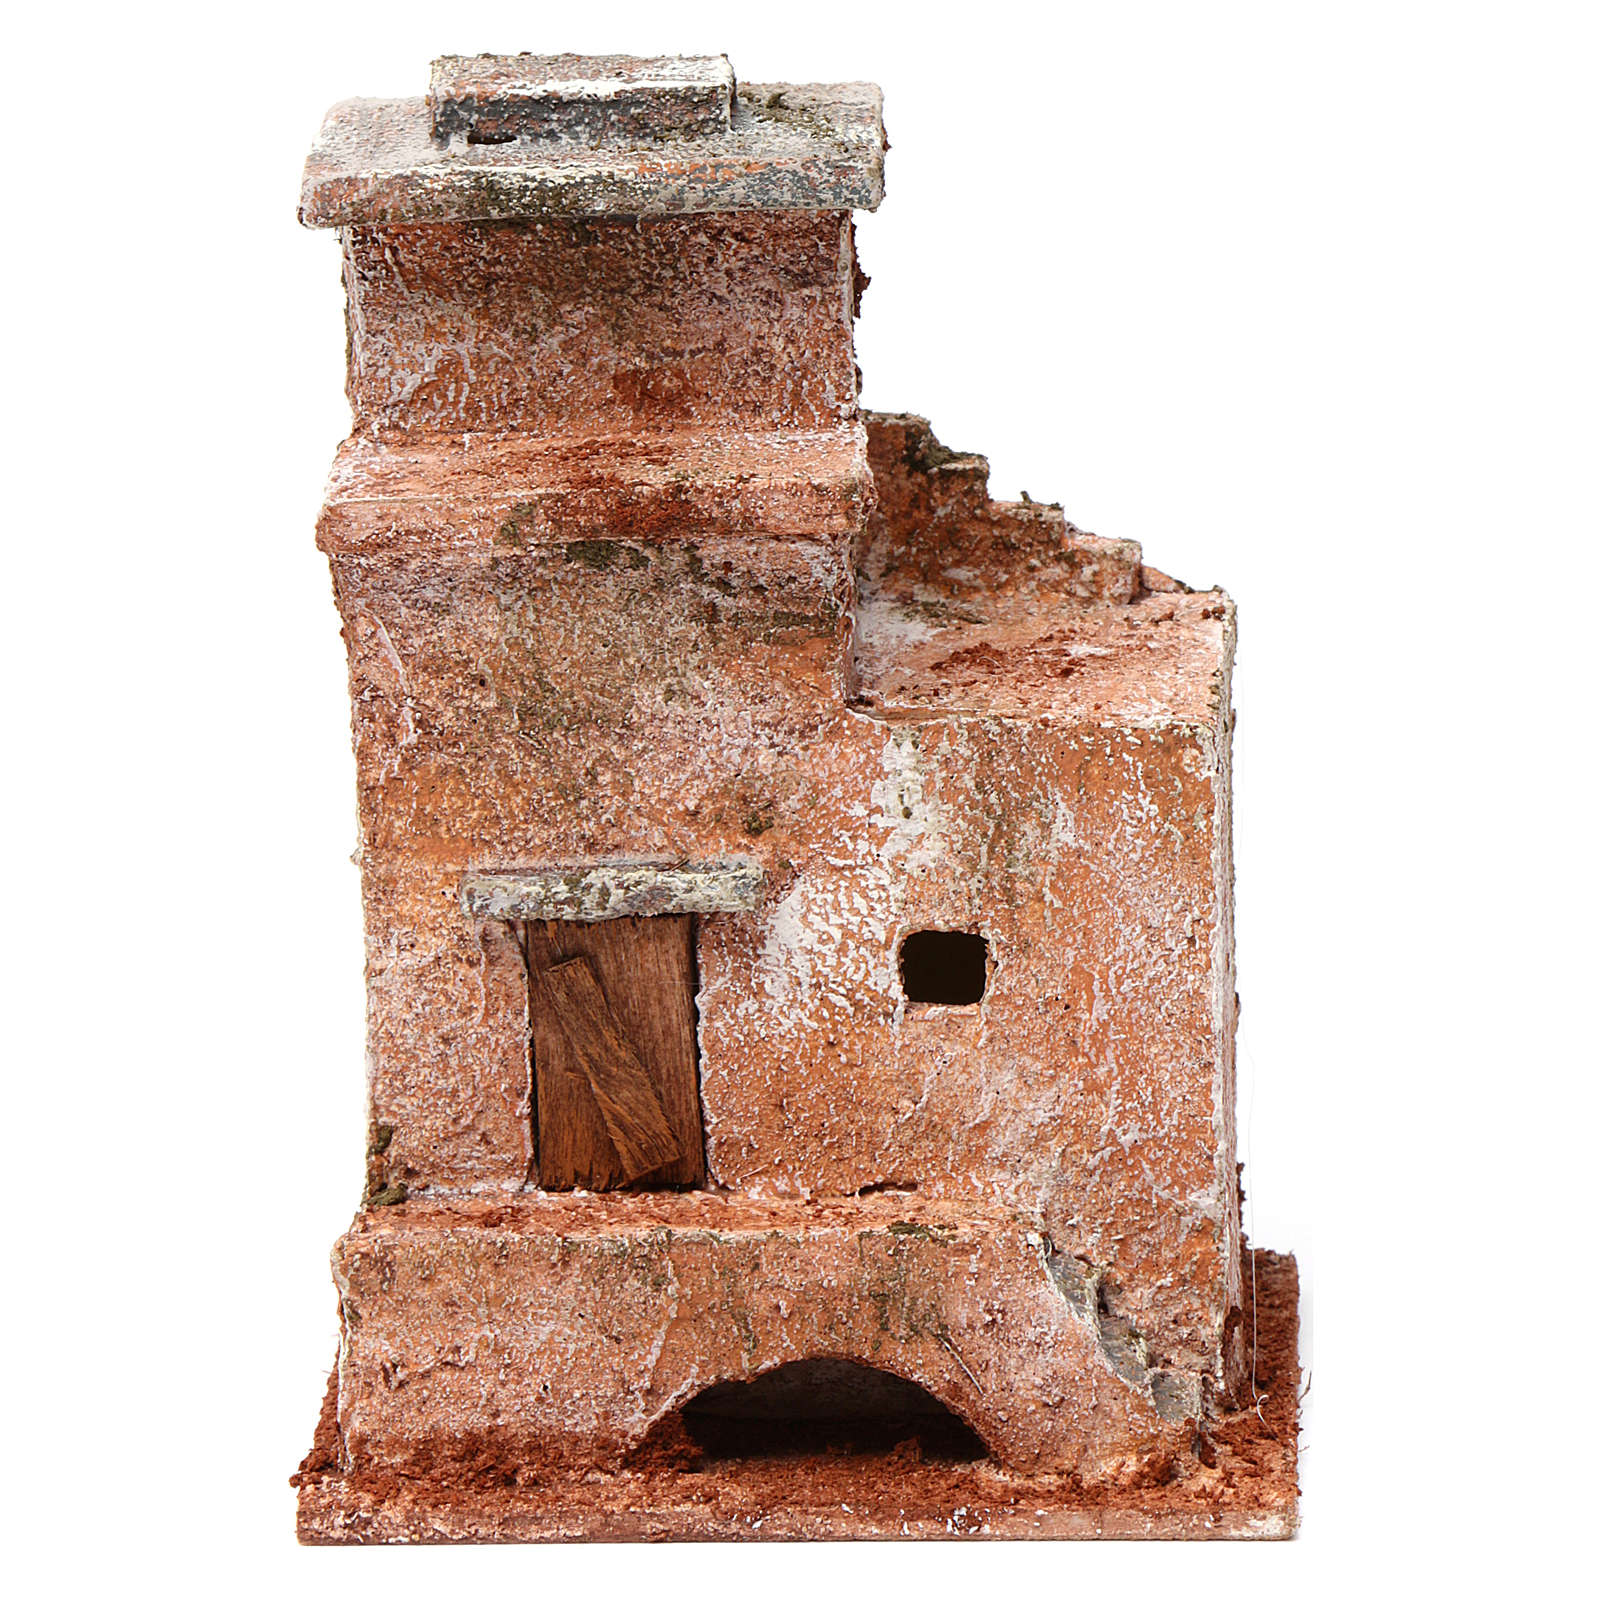 Casa piccola porta legno ponte 15X10X10 stile palestinese cm 4